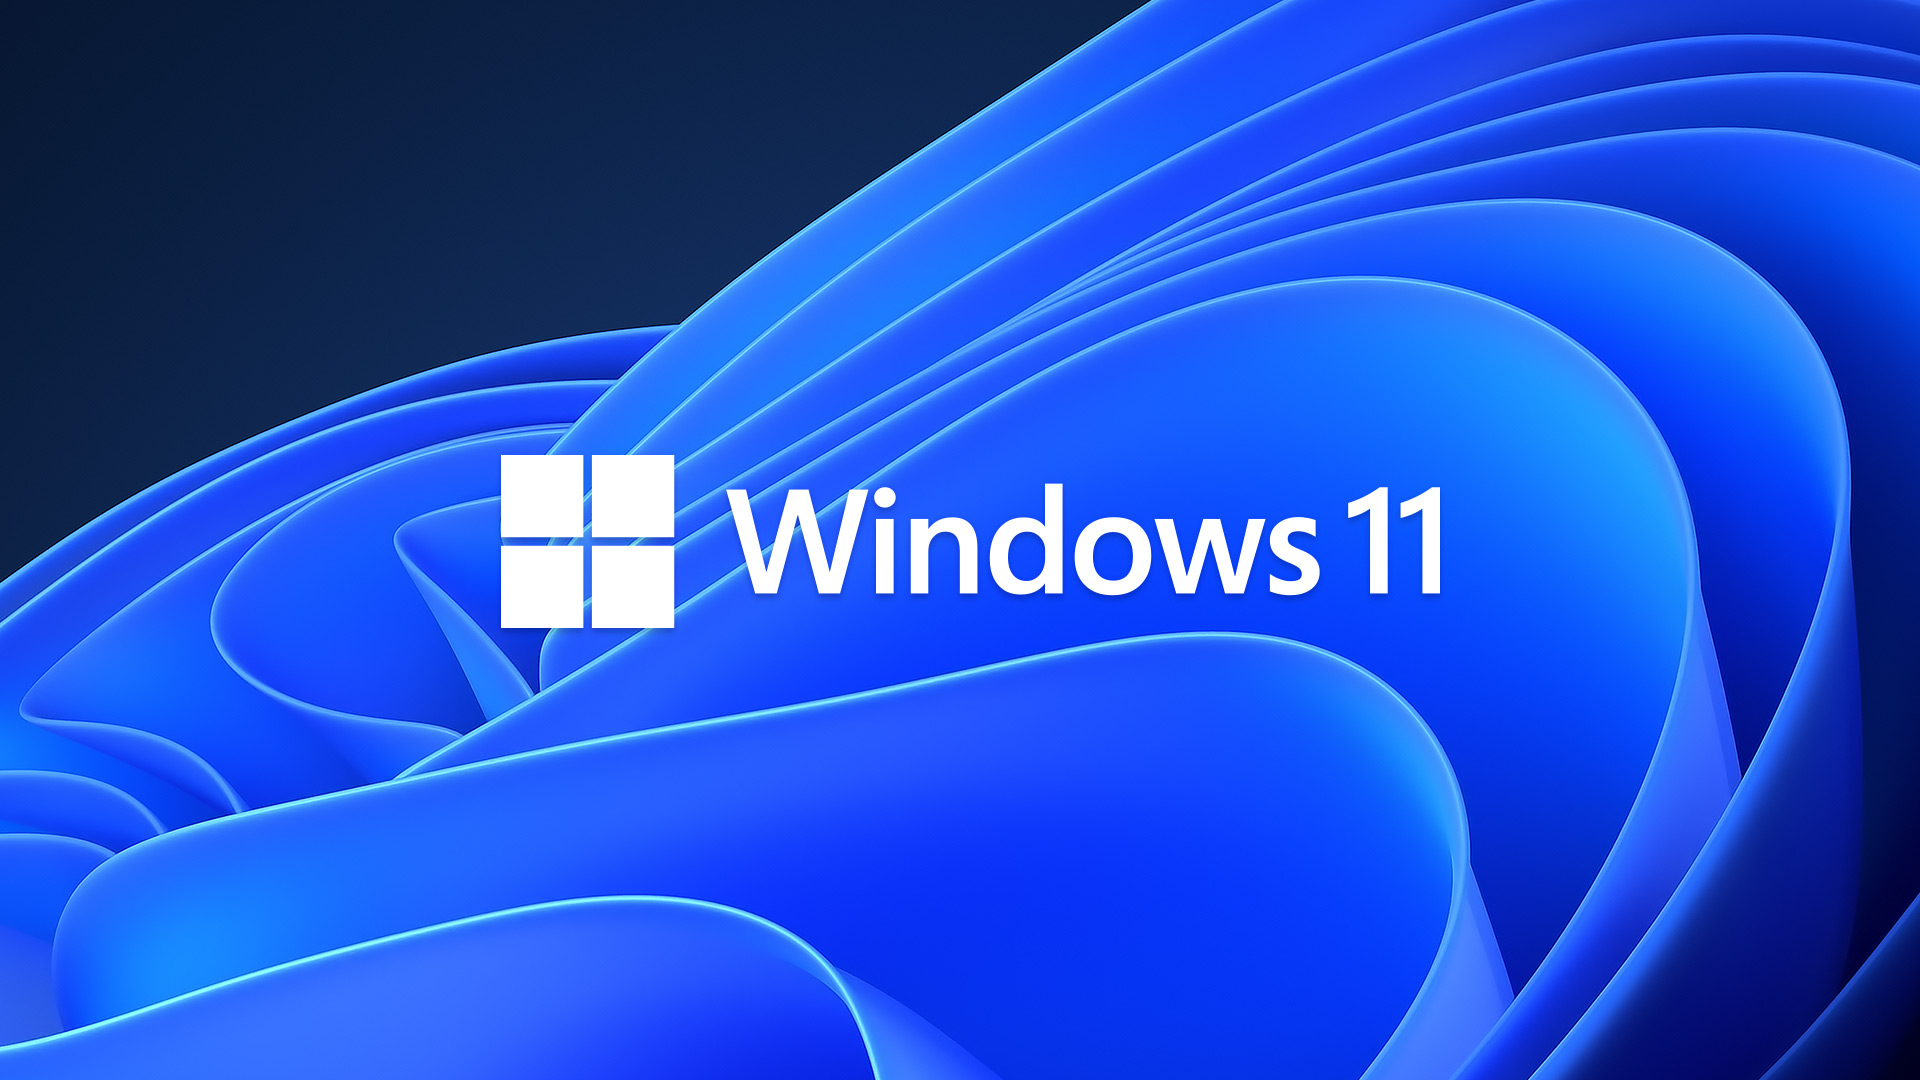 Microsoft Windows 11: Έρχονται στις 5 Οκτωβρίου 2021!